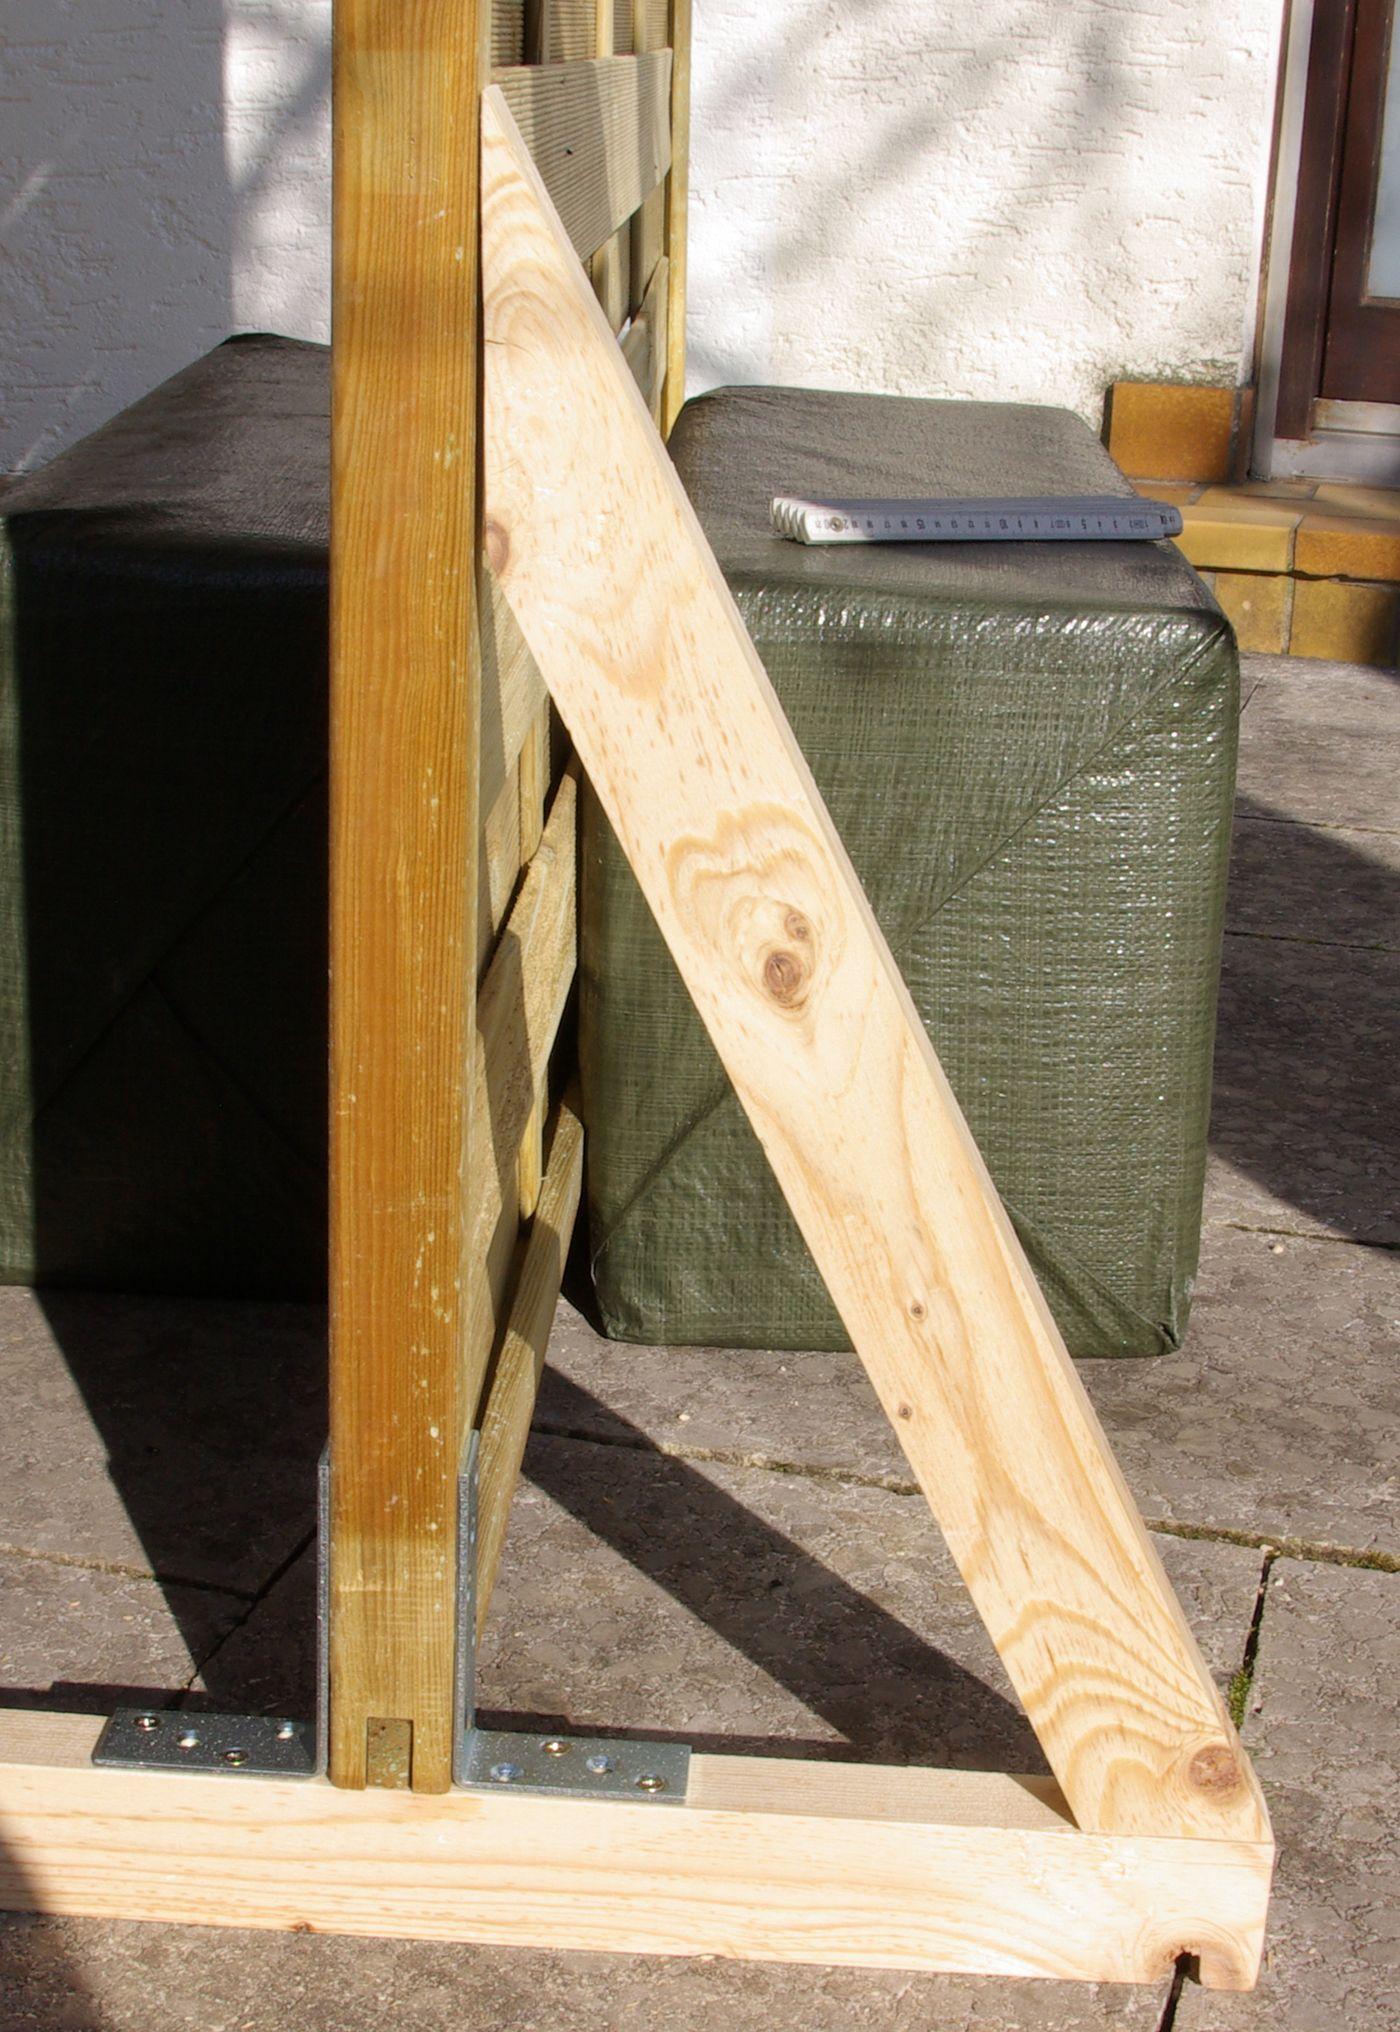 Ideal Sichtschutz Paravent Garten Balkon selber bauen Anleitung DIY ein Fuss fertig